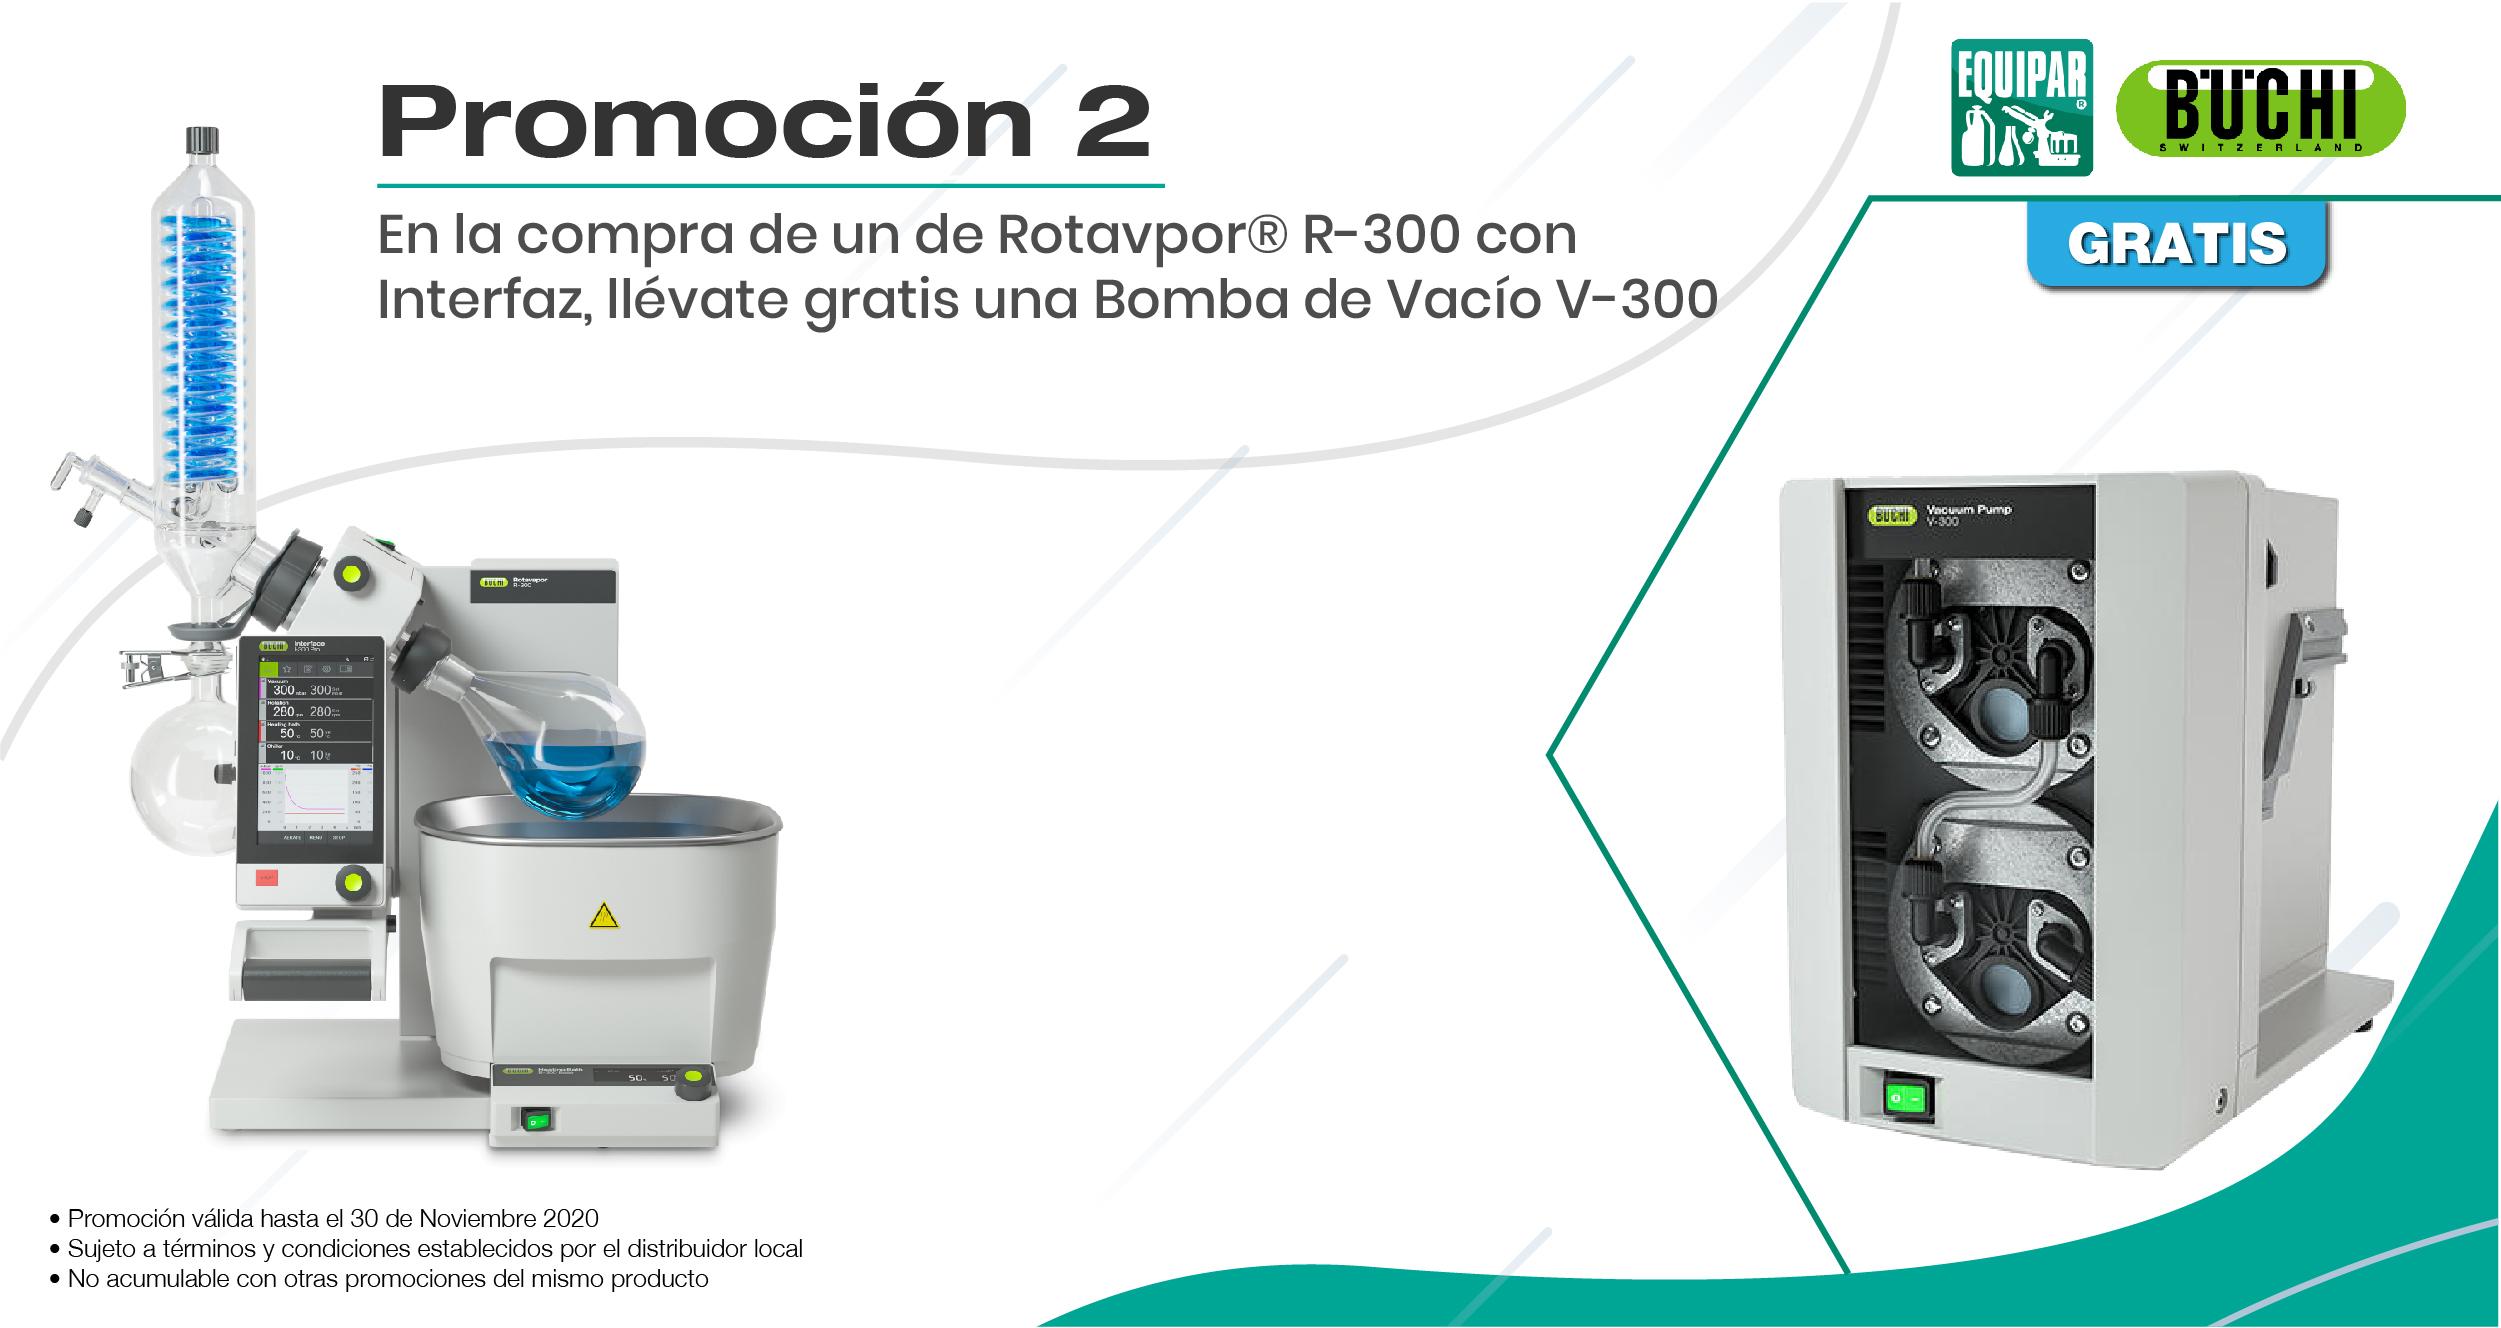 Rotavapor R-300 con Interfaz Image